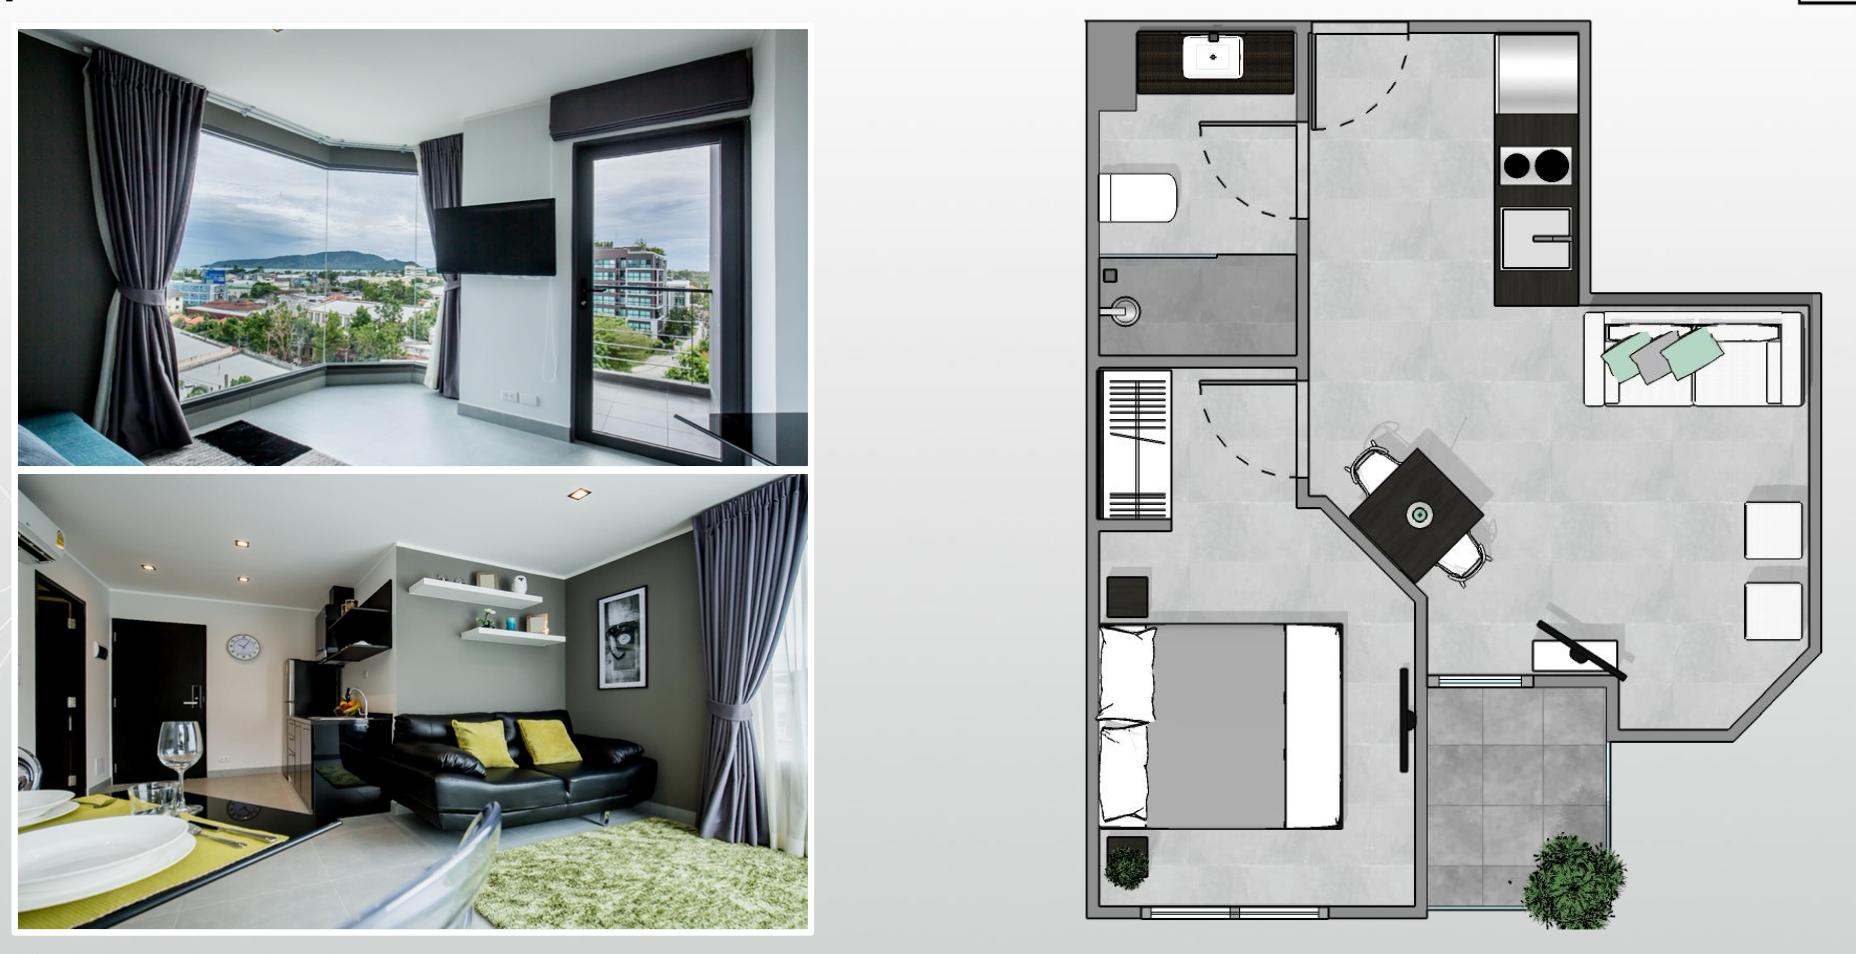 35 m²